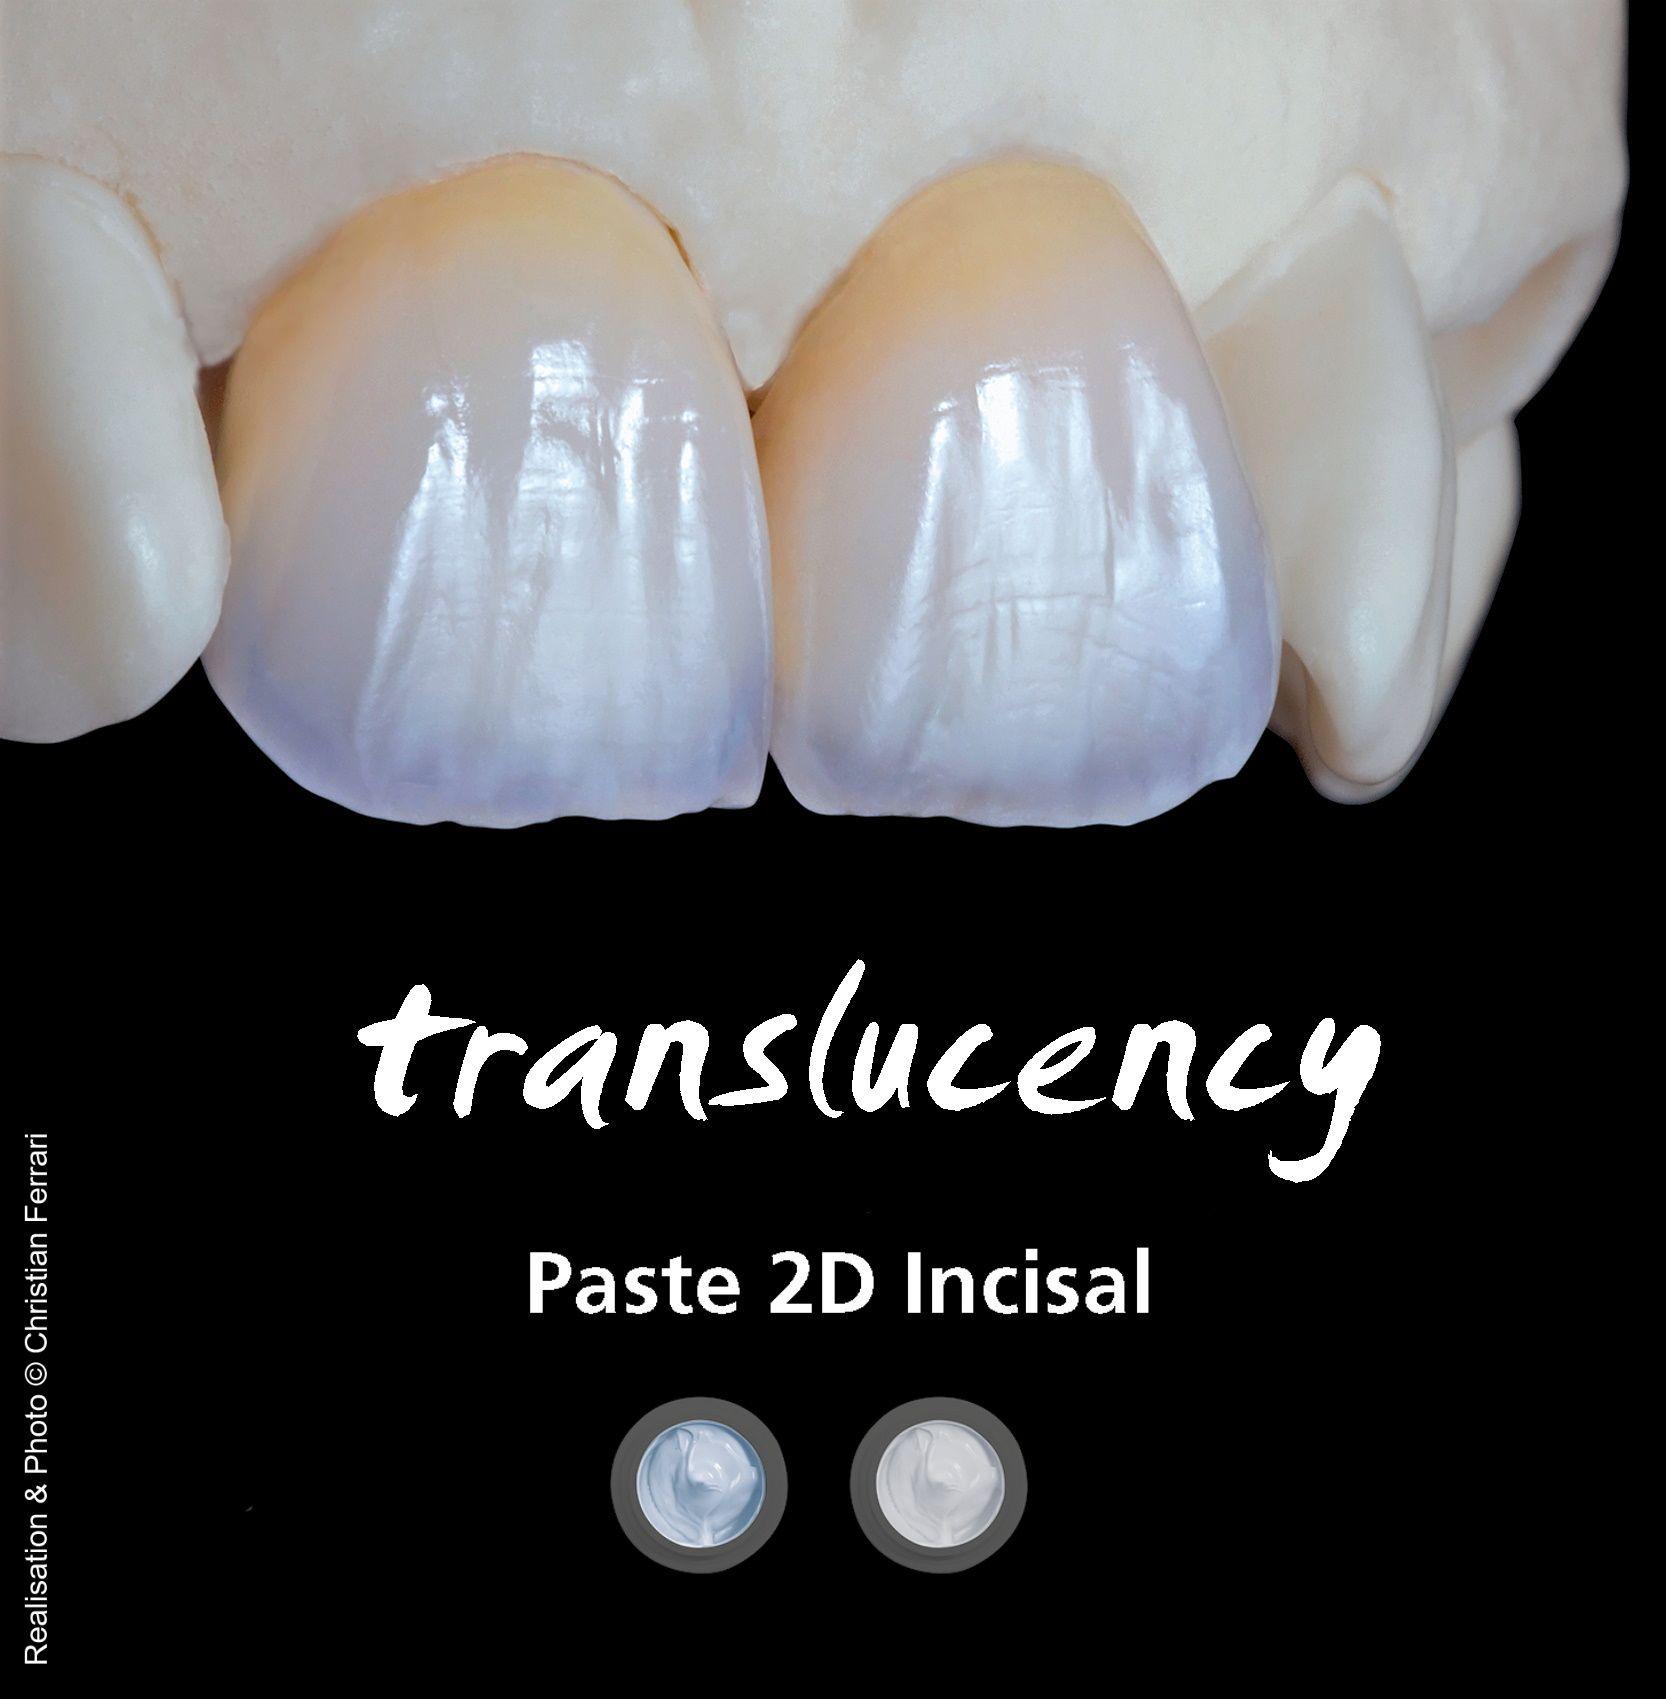 Ceramotion One Touch Paste 2d Incisal In 2020 Dental Art Dental Ceramics Dental Lab